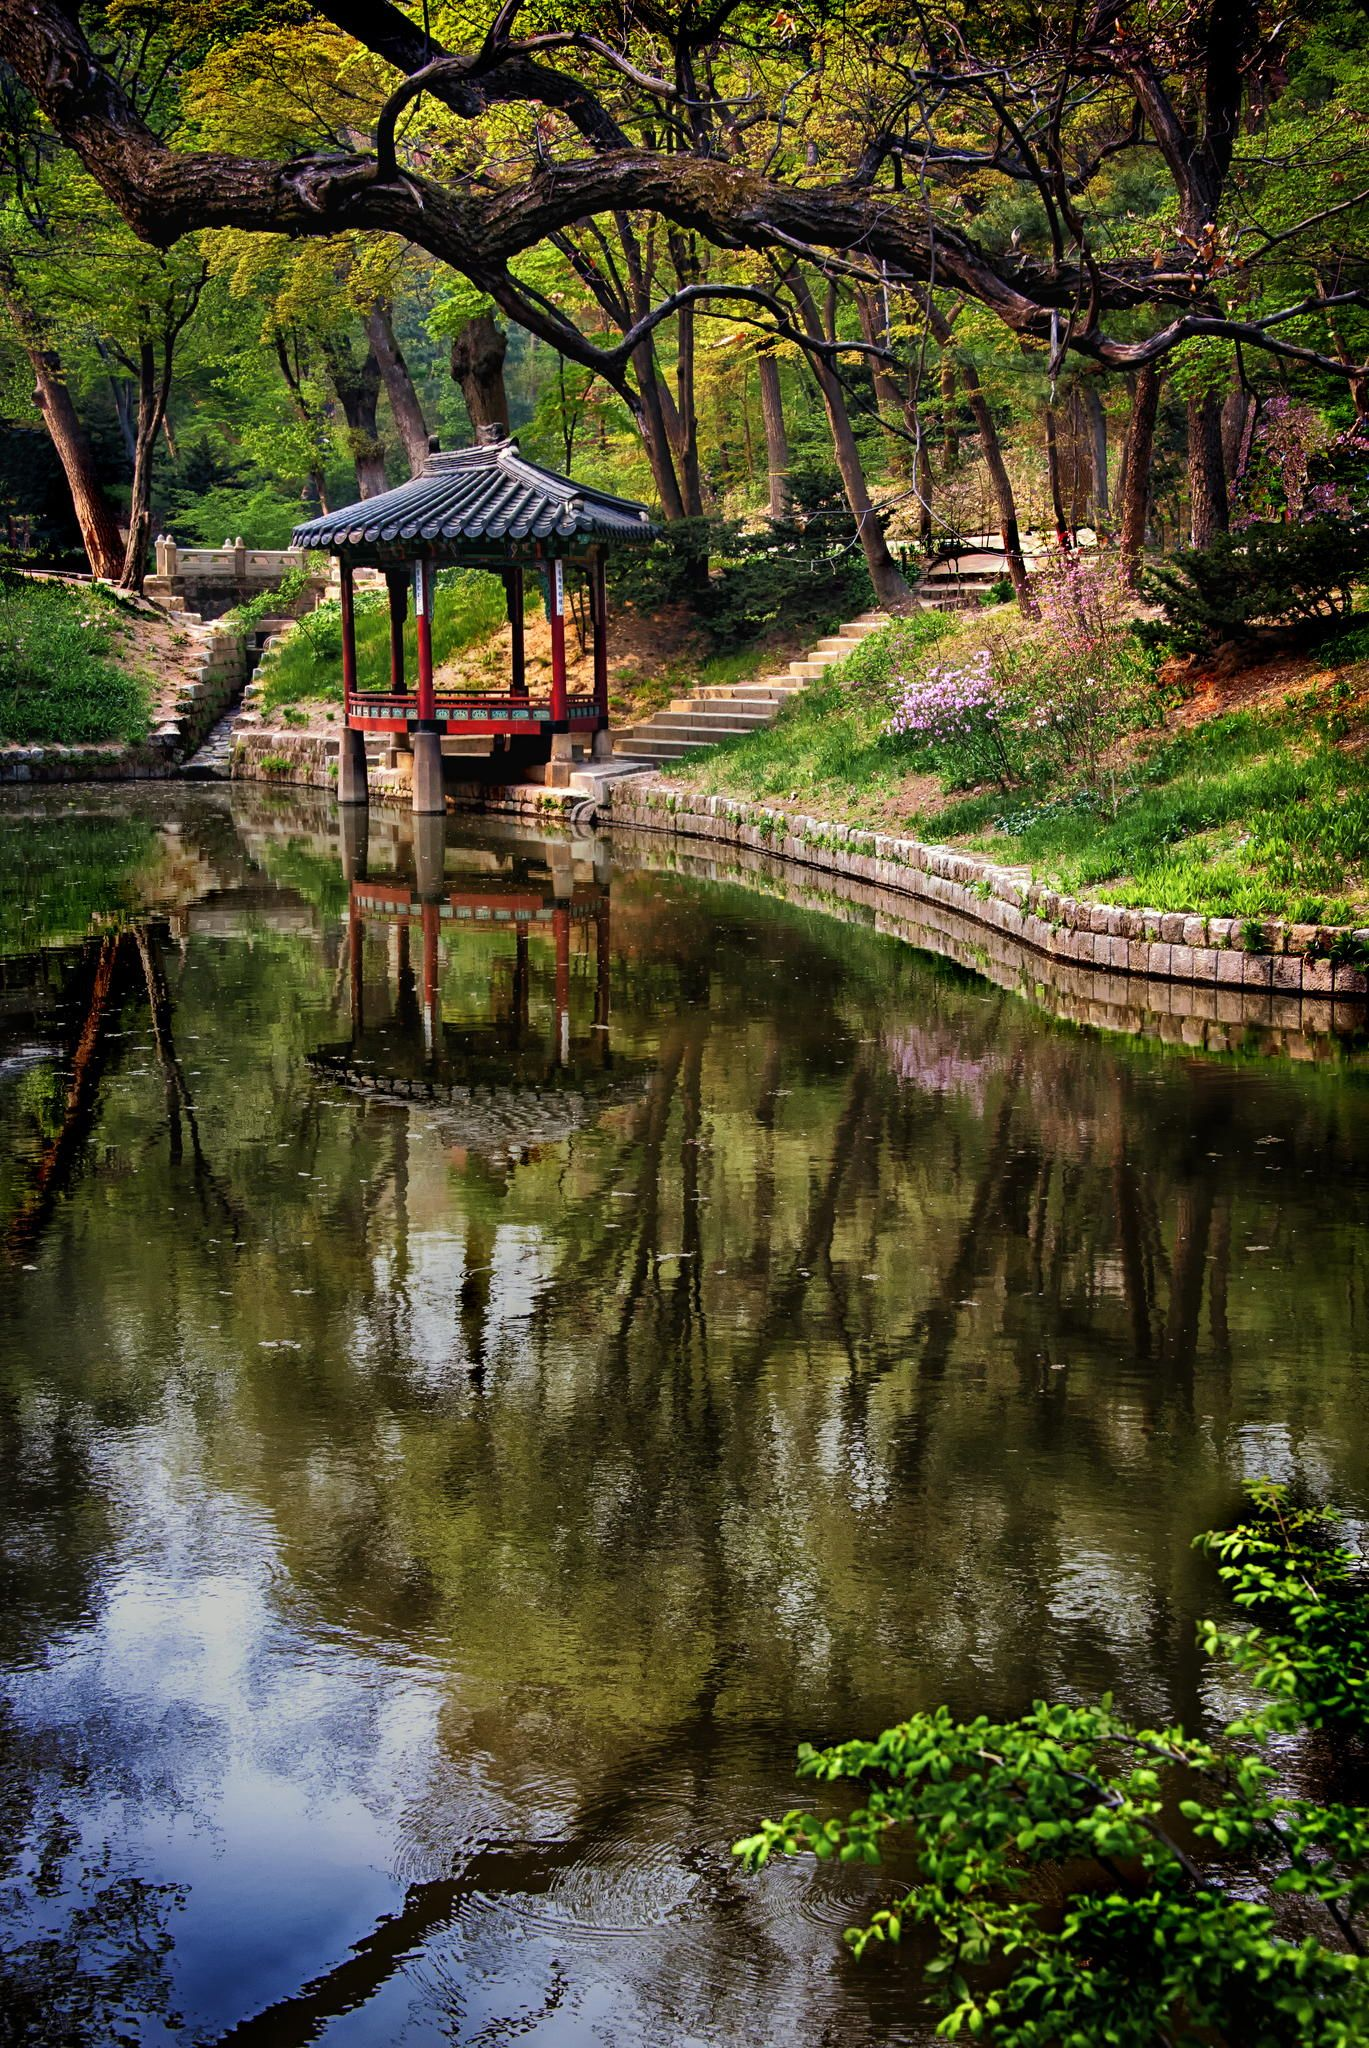 Korean Spring Garden Pond - Biwon Garden, Changdeok Palace, Seoul ...